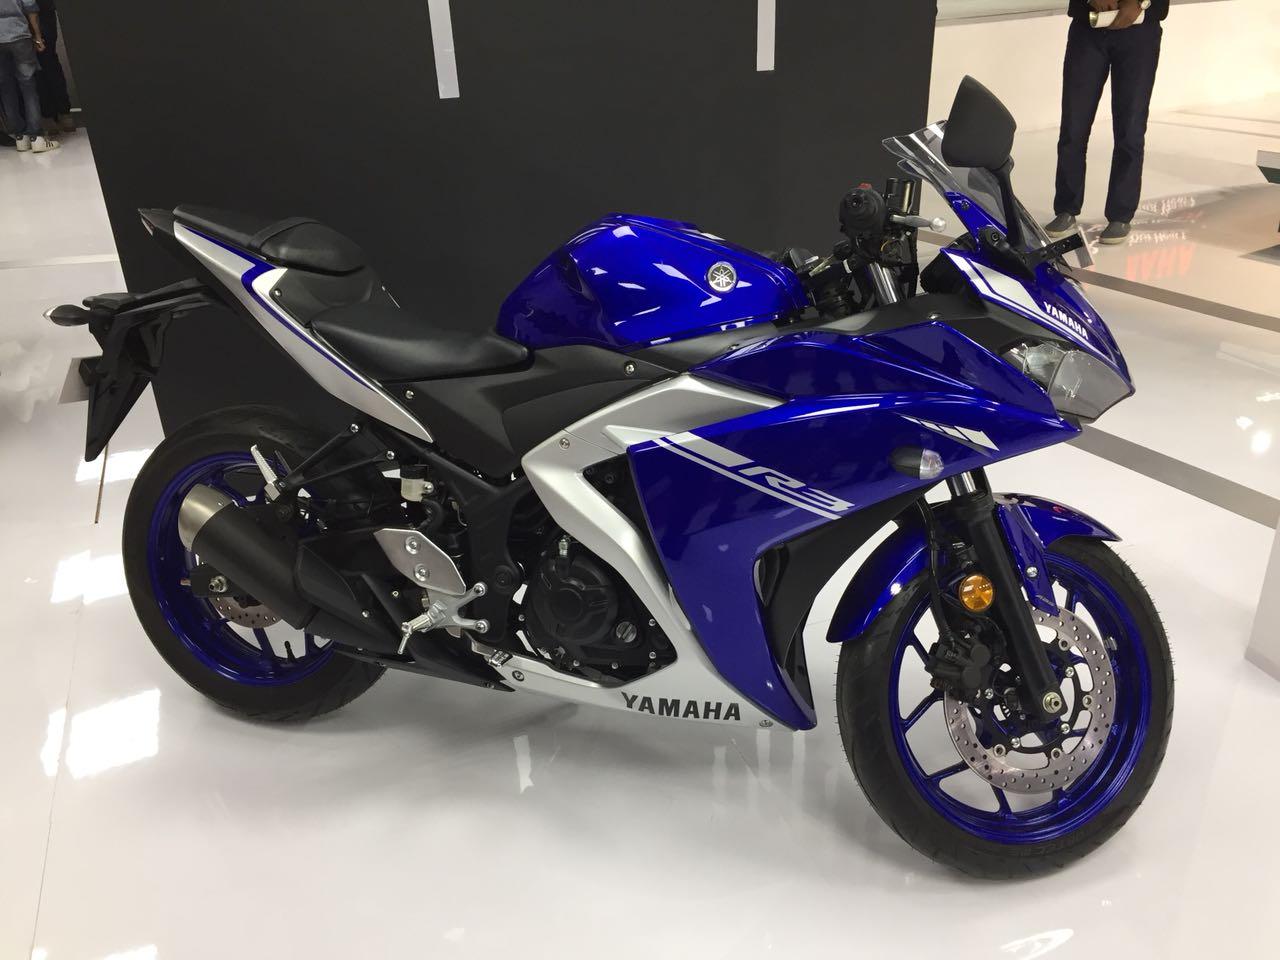 Yamaha R Price In Philippines